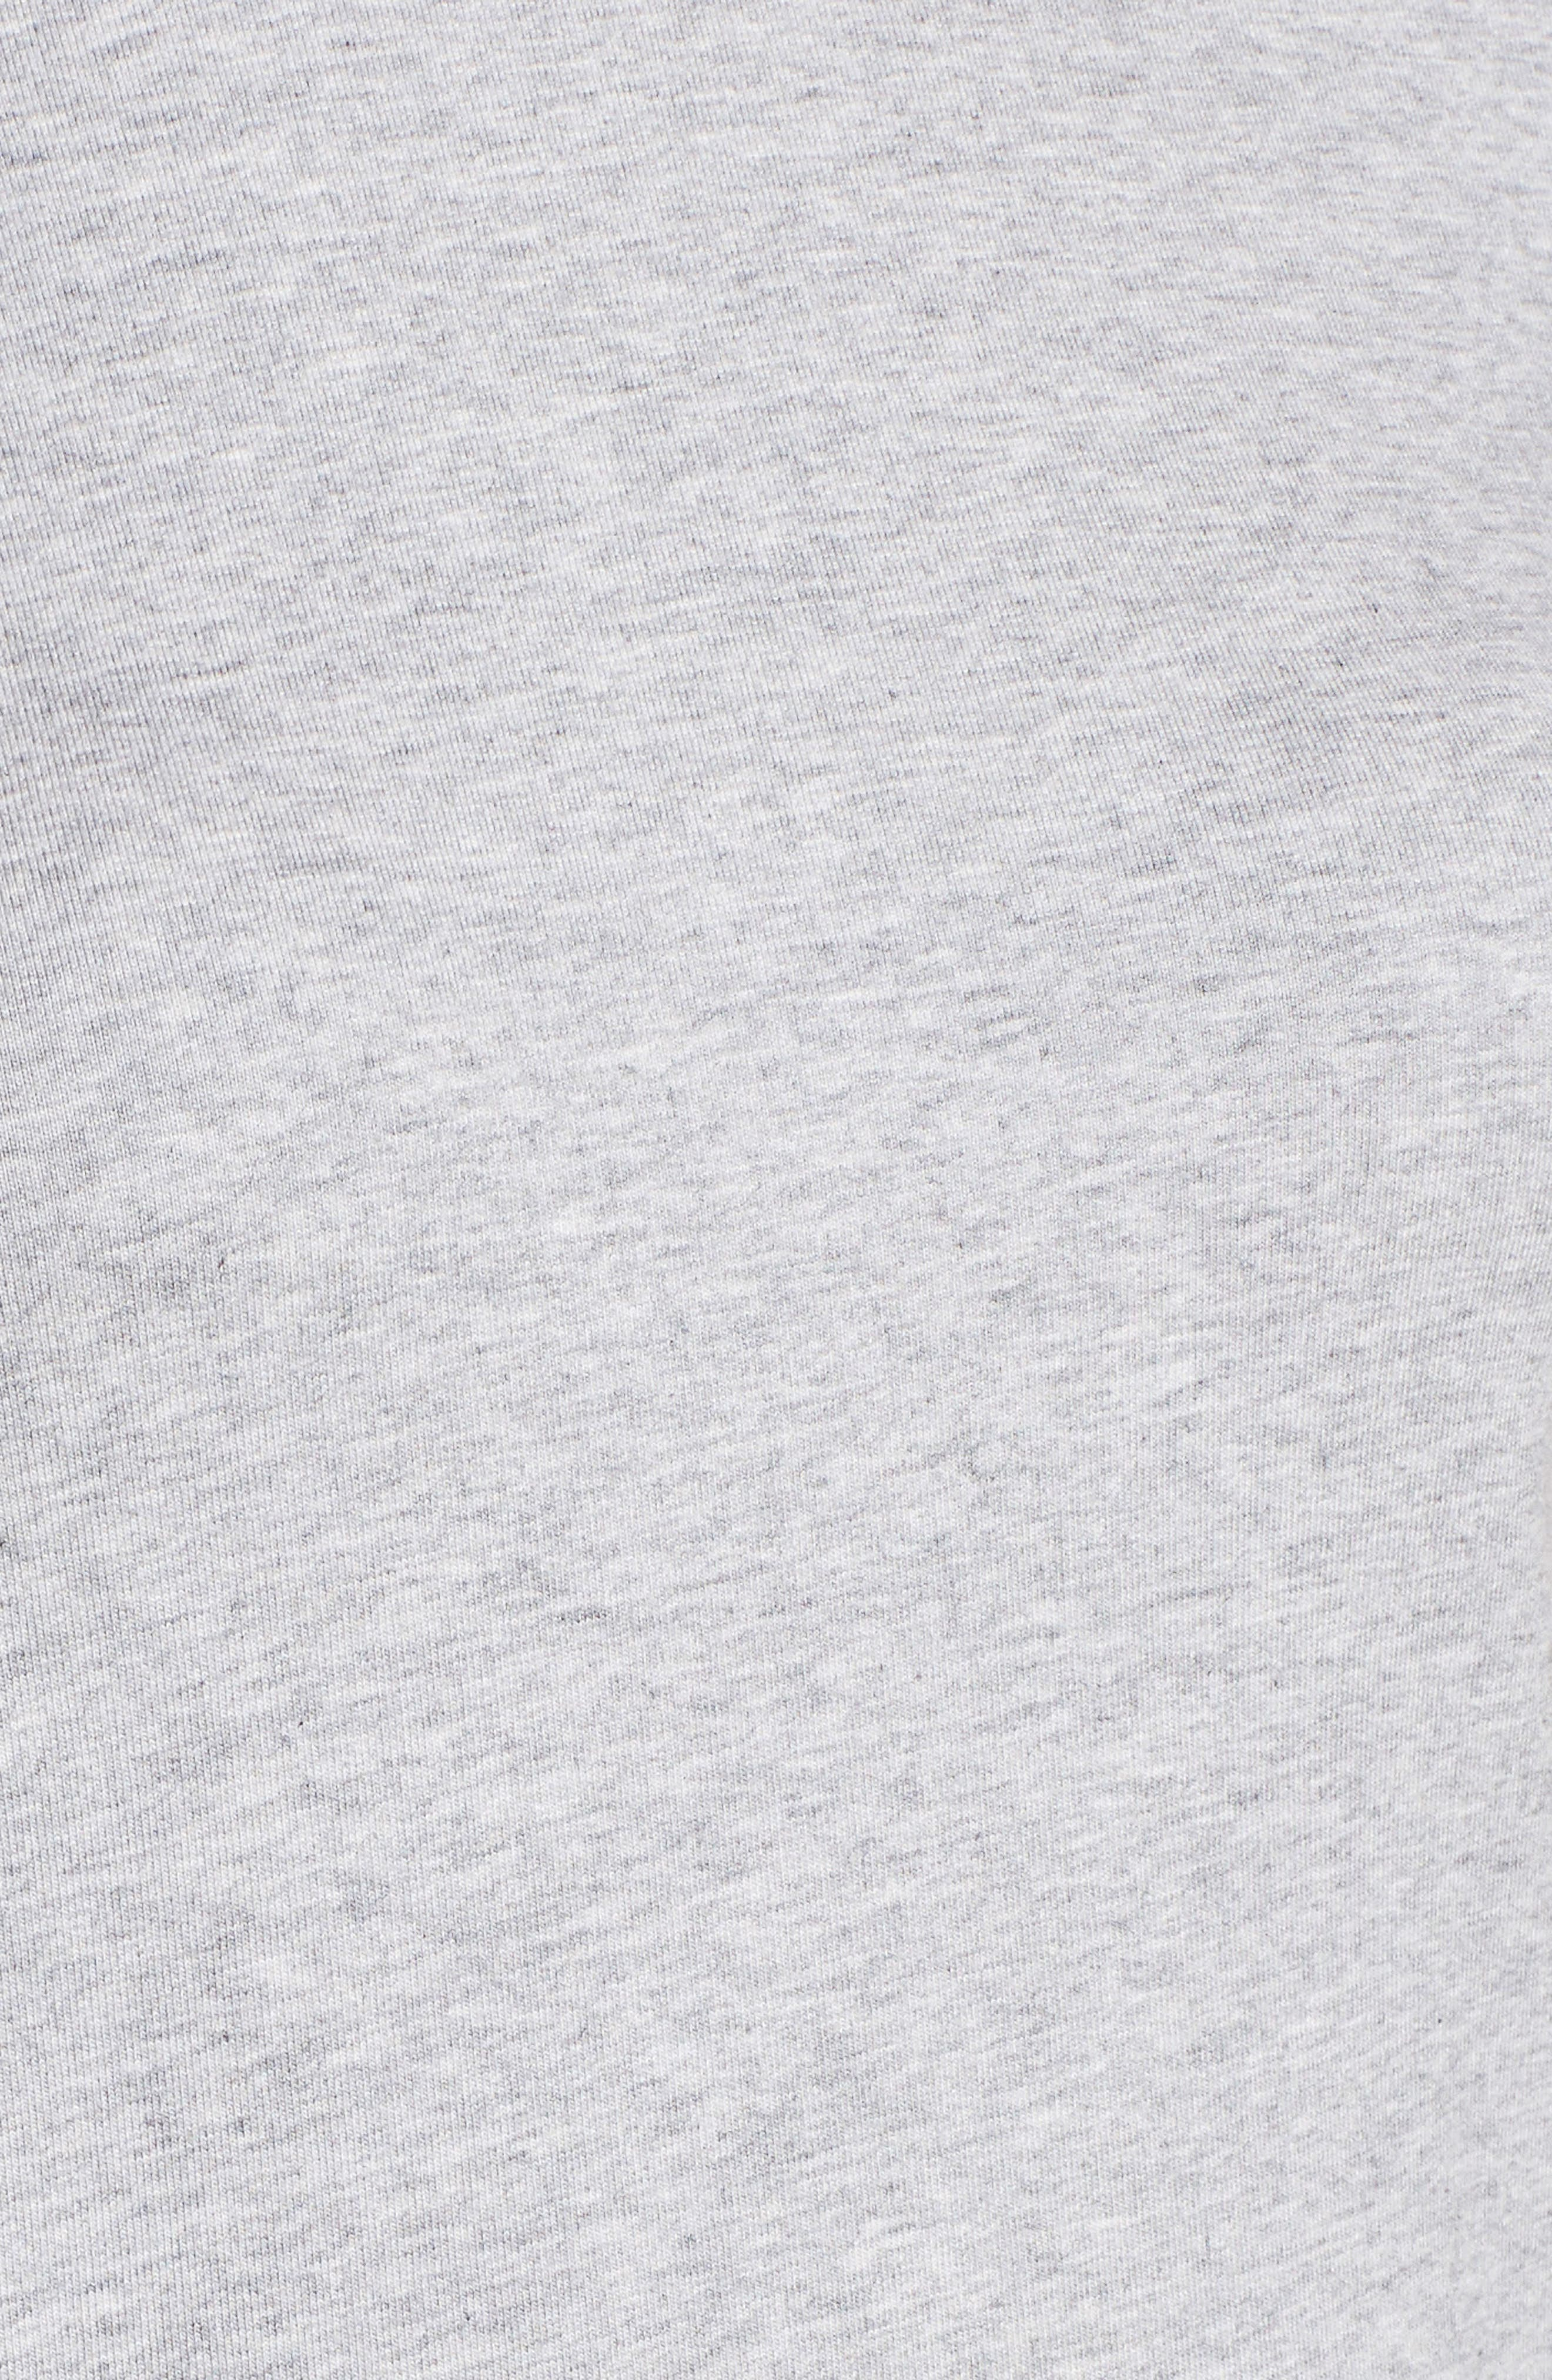 Ruffle Detail Knit Dress,                             Alternate thumbnail 17, color,